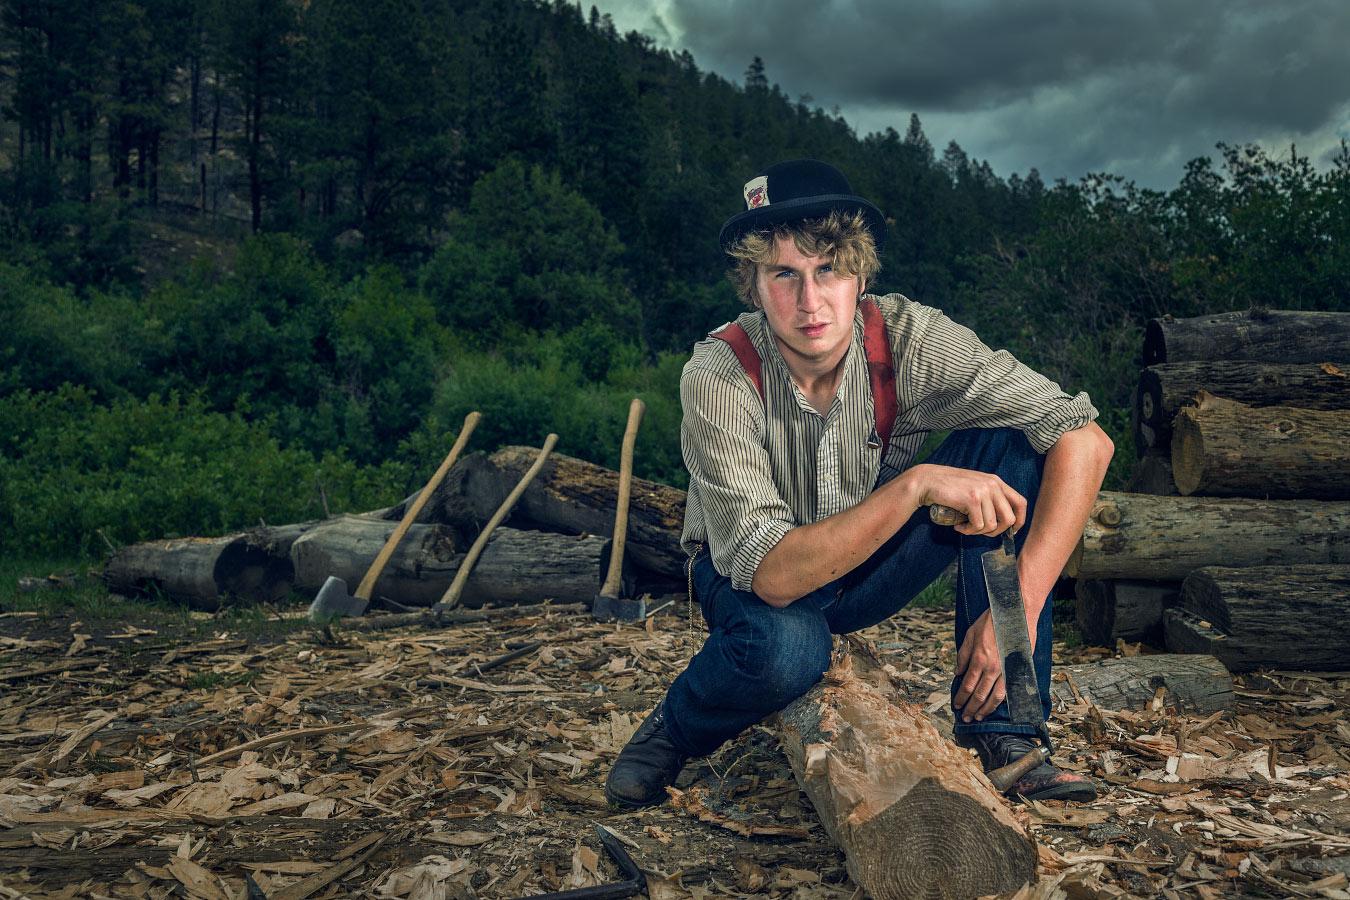 Zachary Garmoe Logger Pueblano Philmont Scout Ranch Cimarron New Mexico